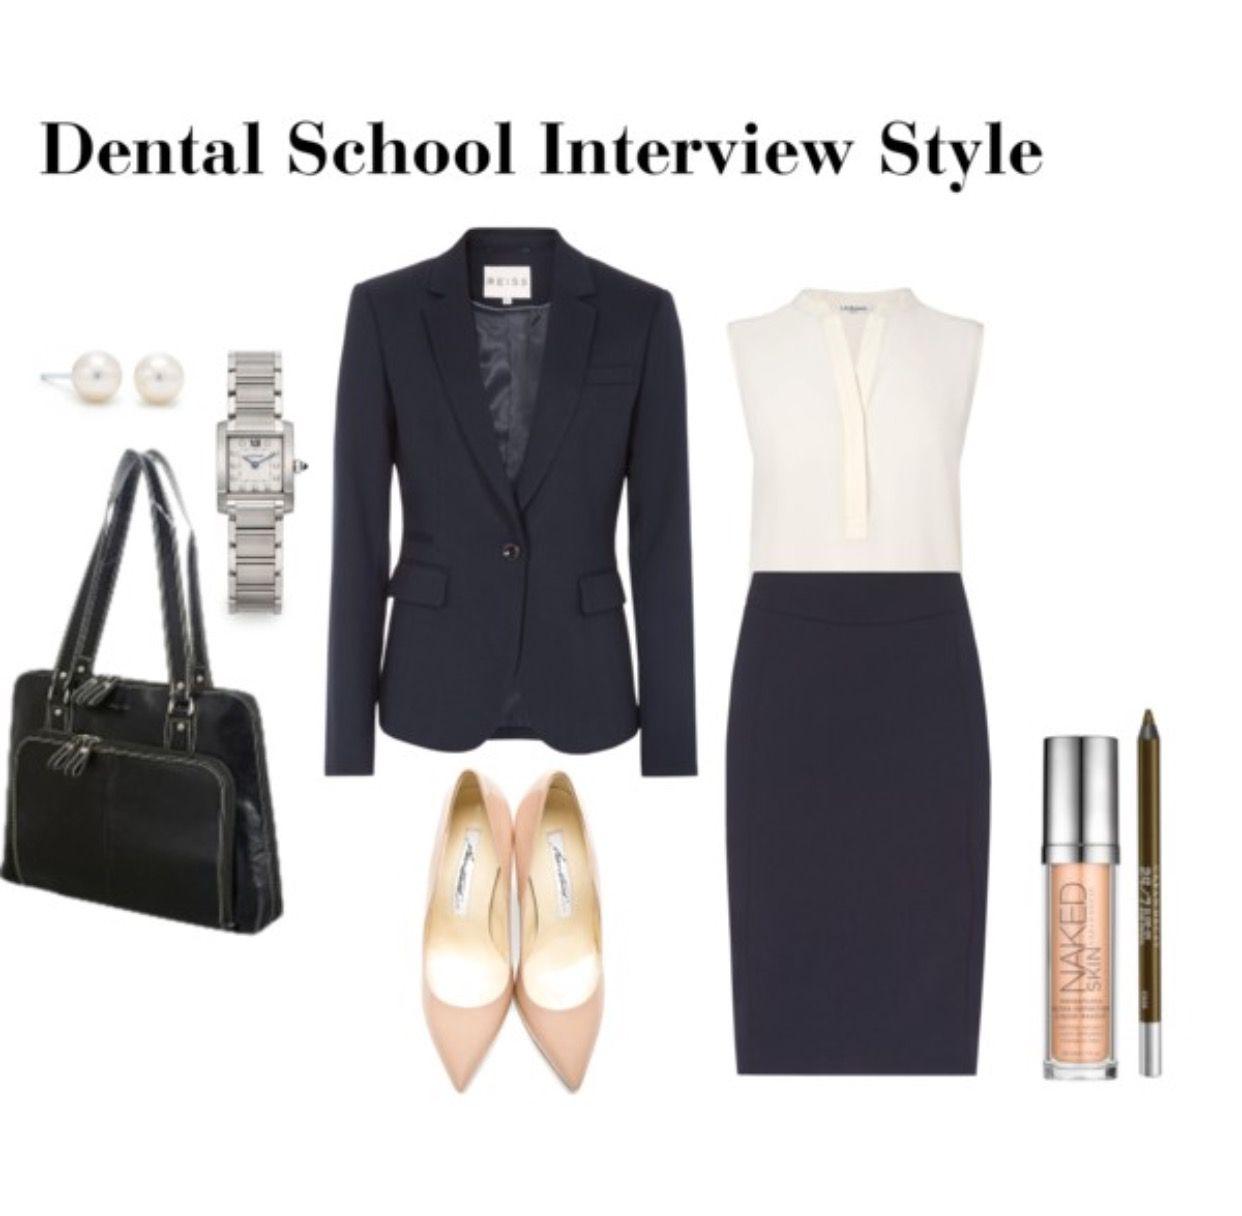 dental school interview attire my future interview dental school interview attire assisting